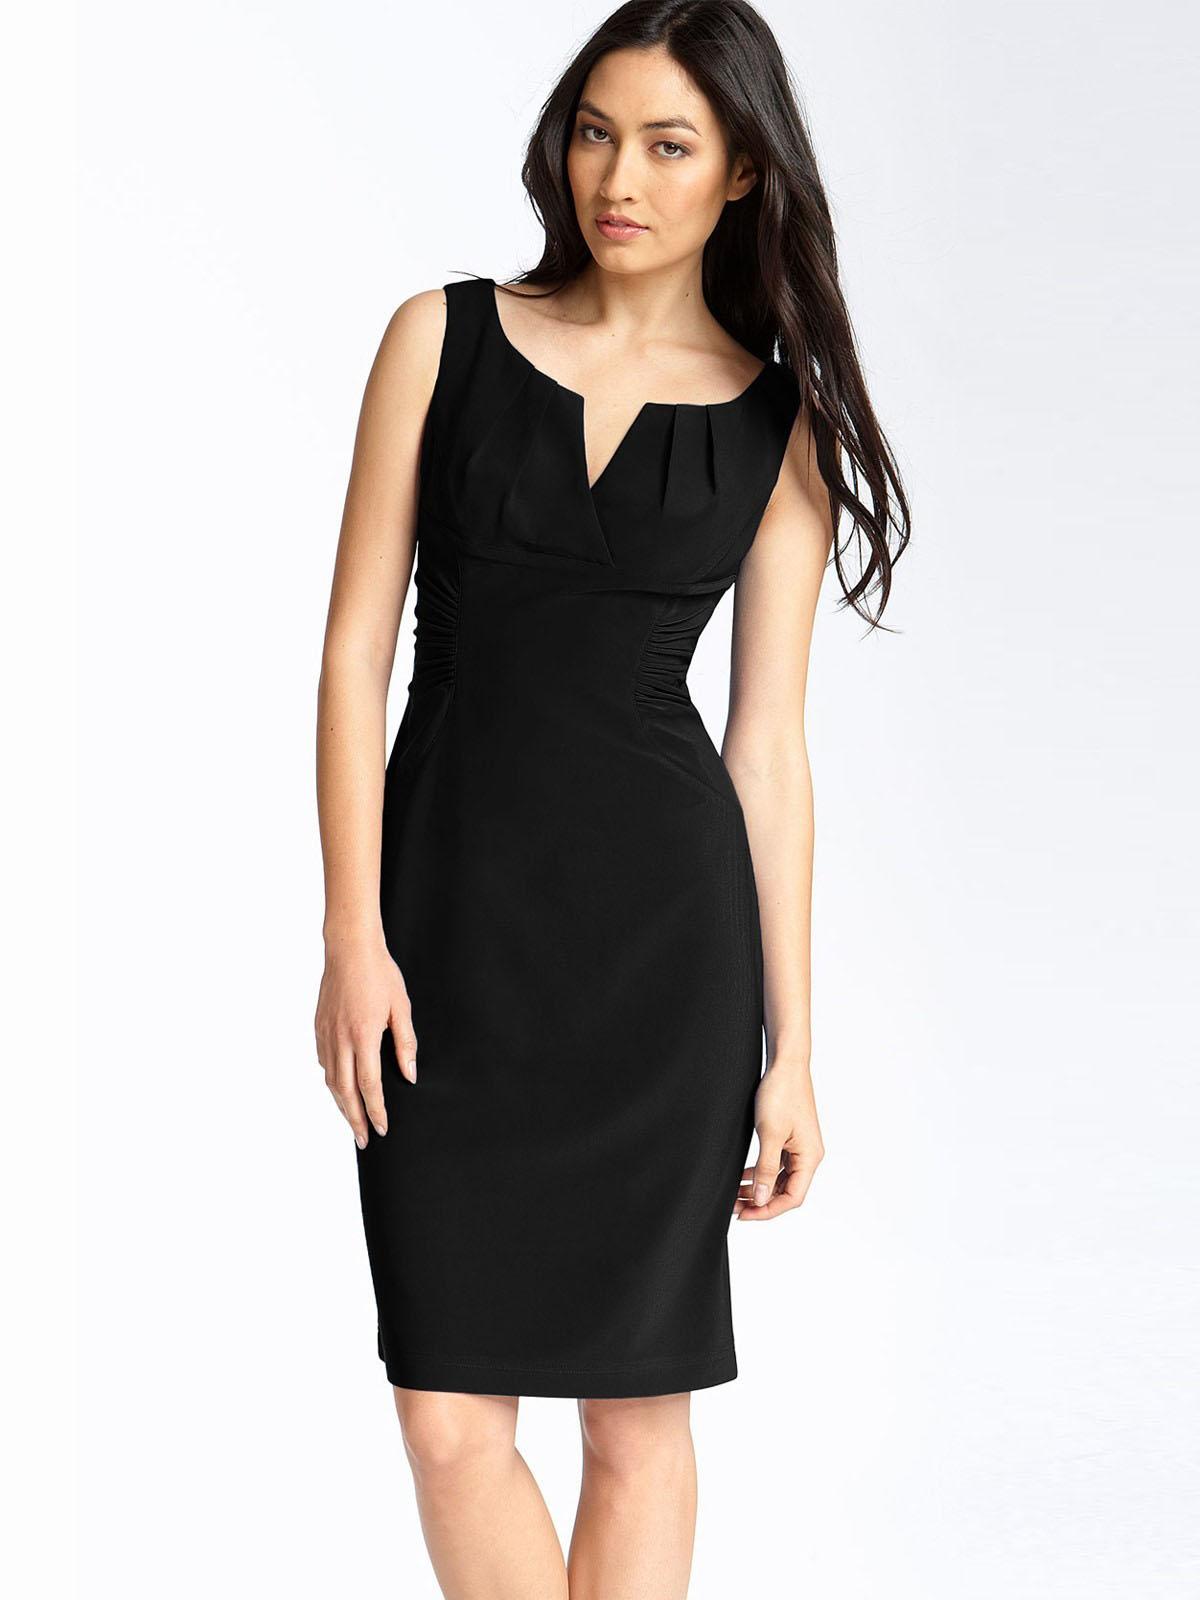 Black Cocktail Dress Picture Collection Dressedupgirl Com